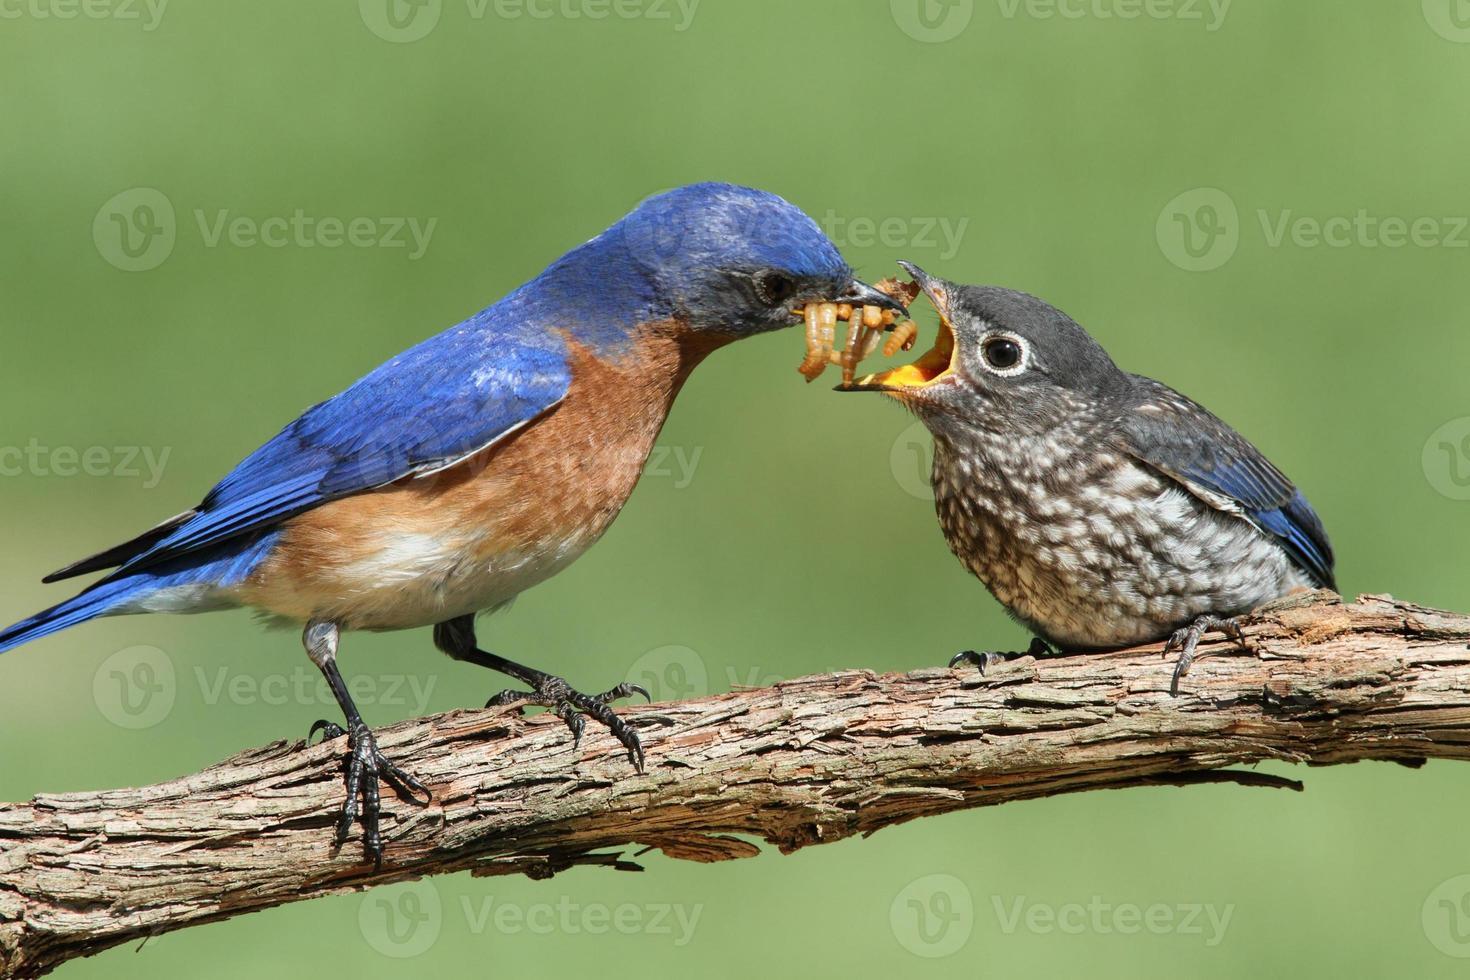 manlig östra blåfågel med baby foto